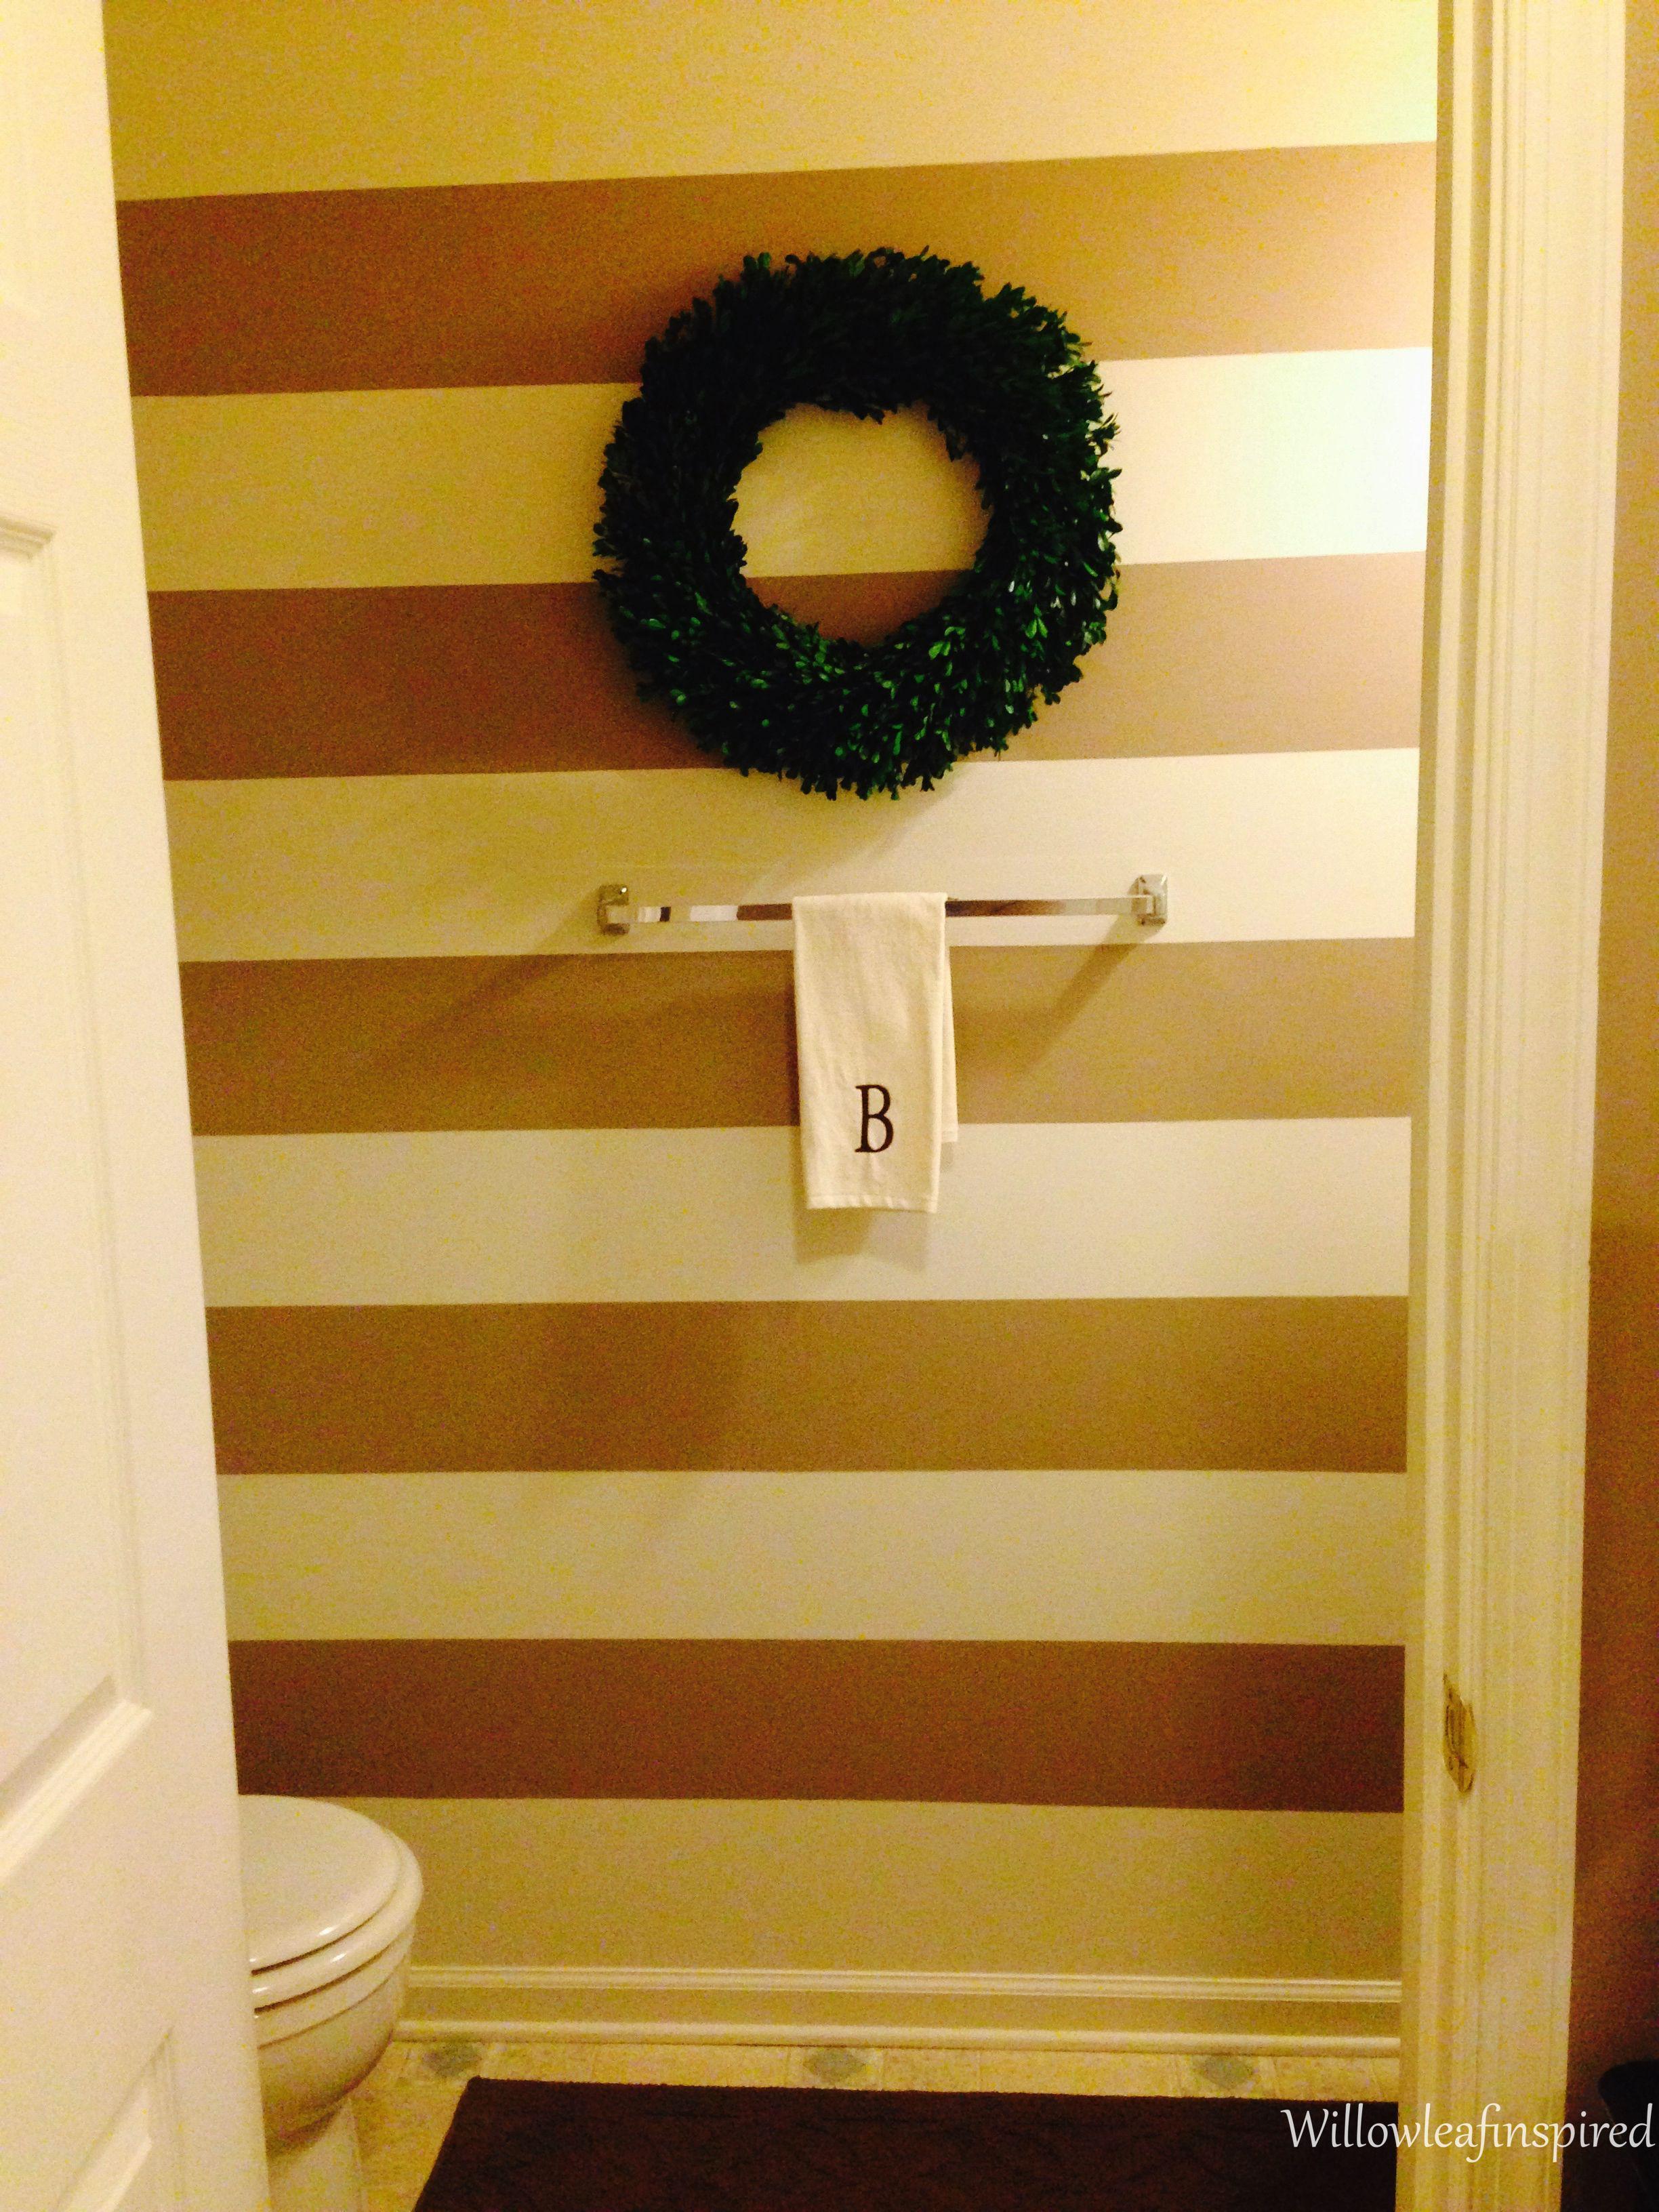 Striped Wall | White Walls Group Ideas | Pinterest | Striped walls ...